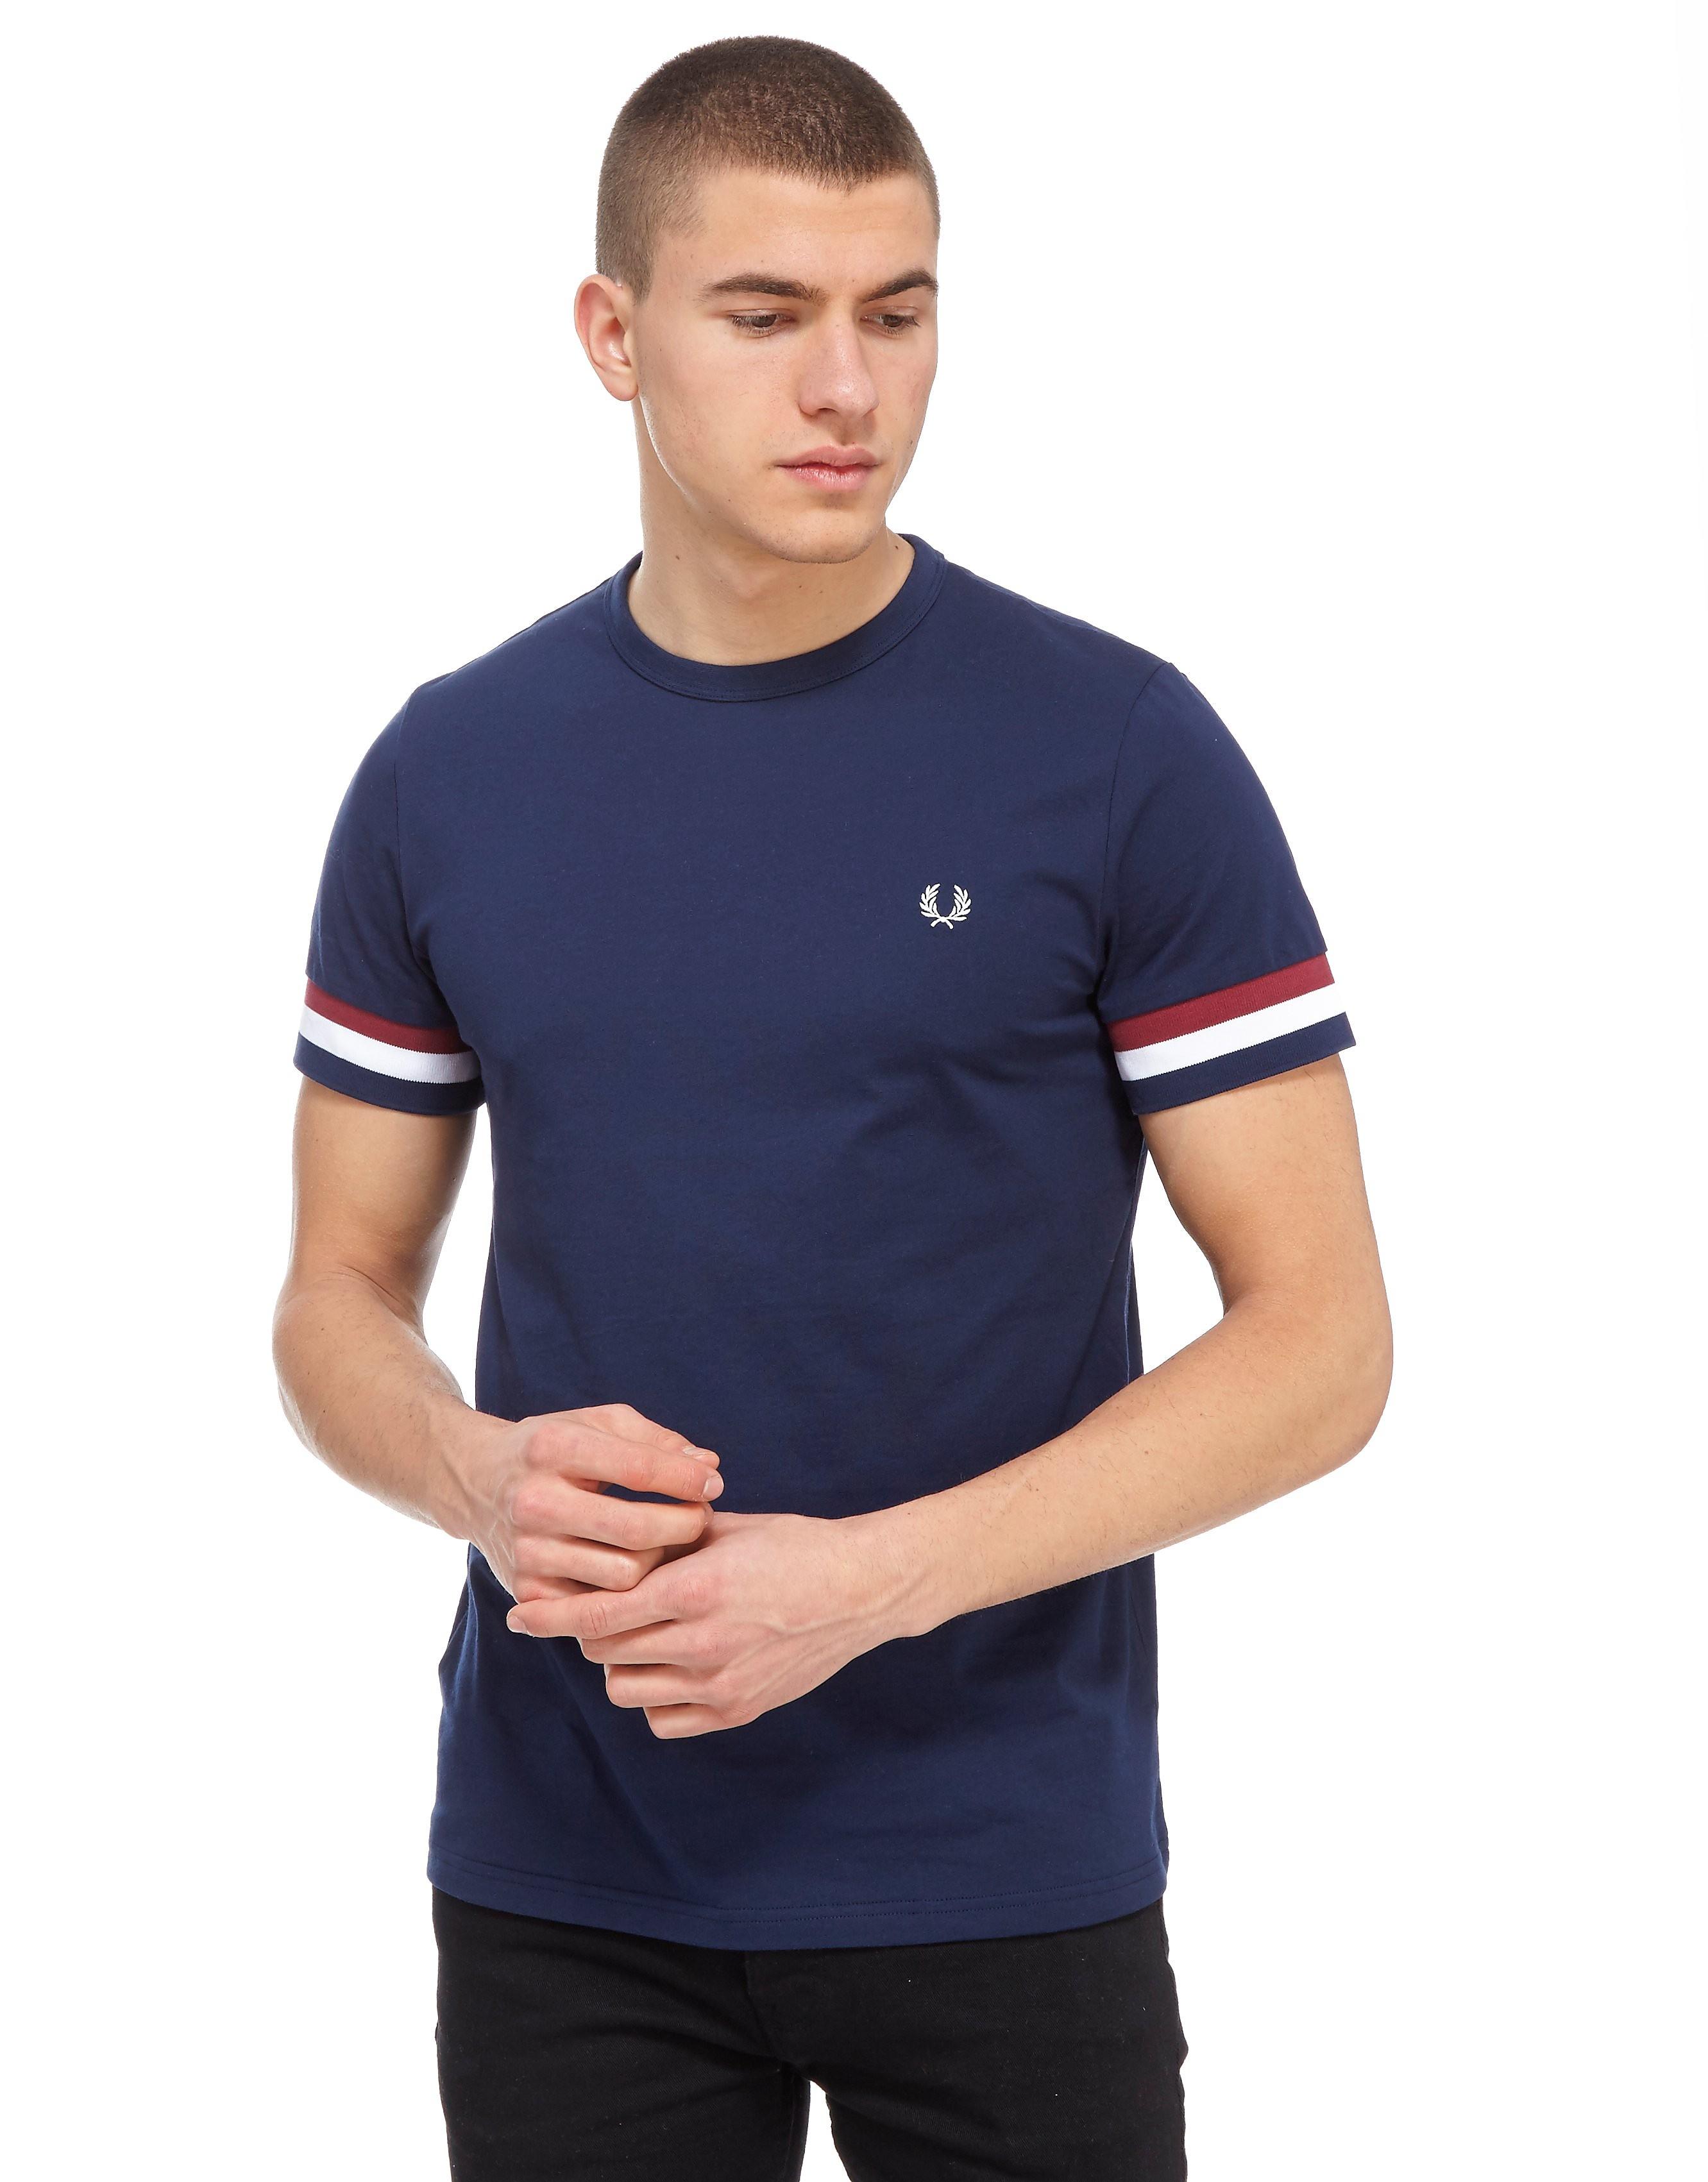 Fred Perry Stripe Cuff T-Shirt